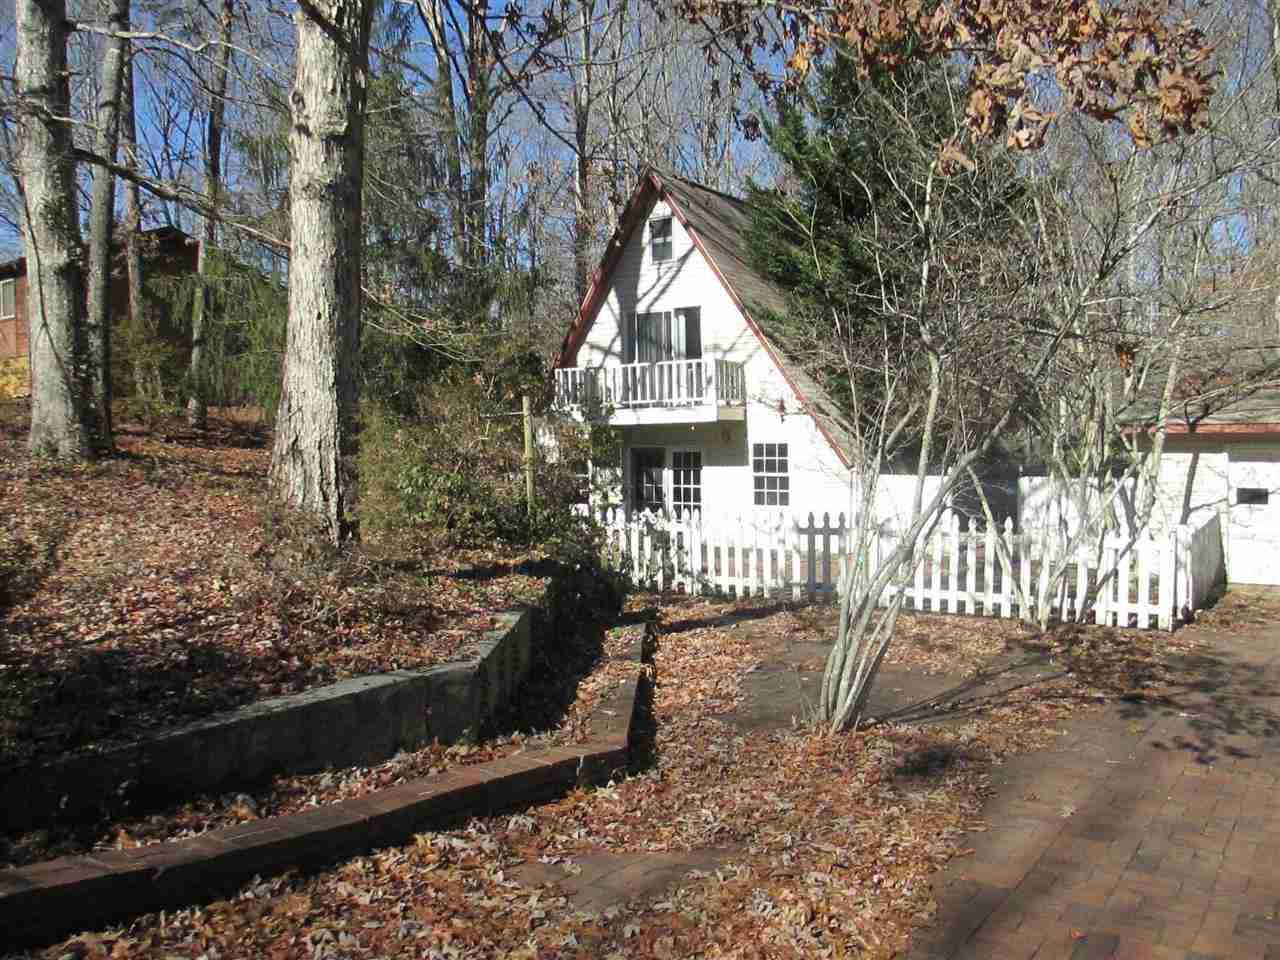 Rental Homes for Rent, ListingId:31611647, location: 11000 Ferncliff Dr. Seneca 29678